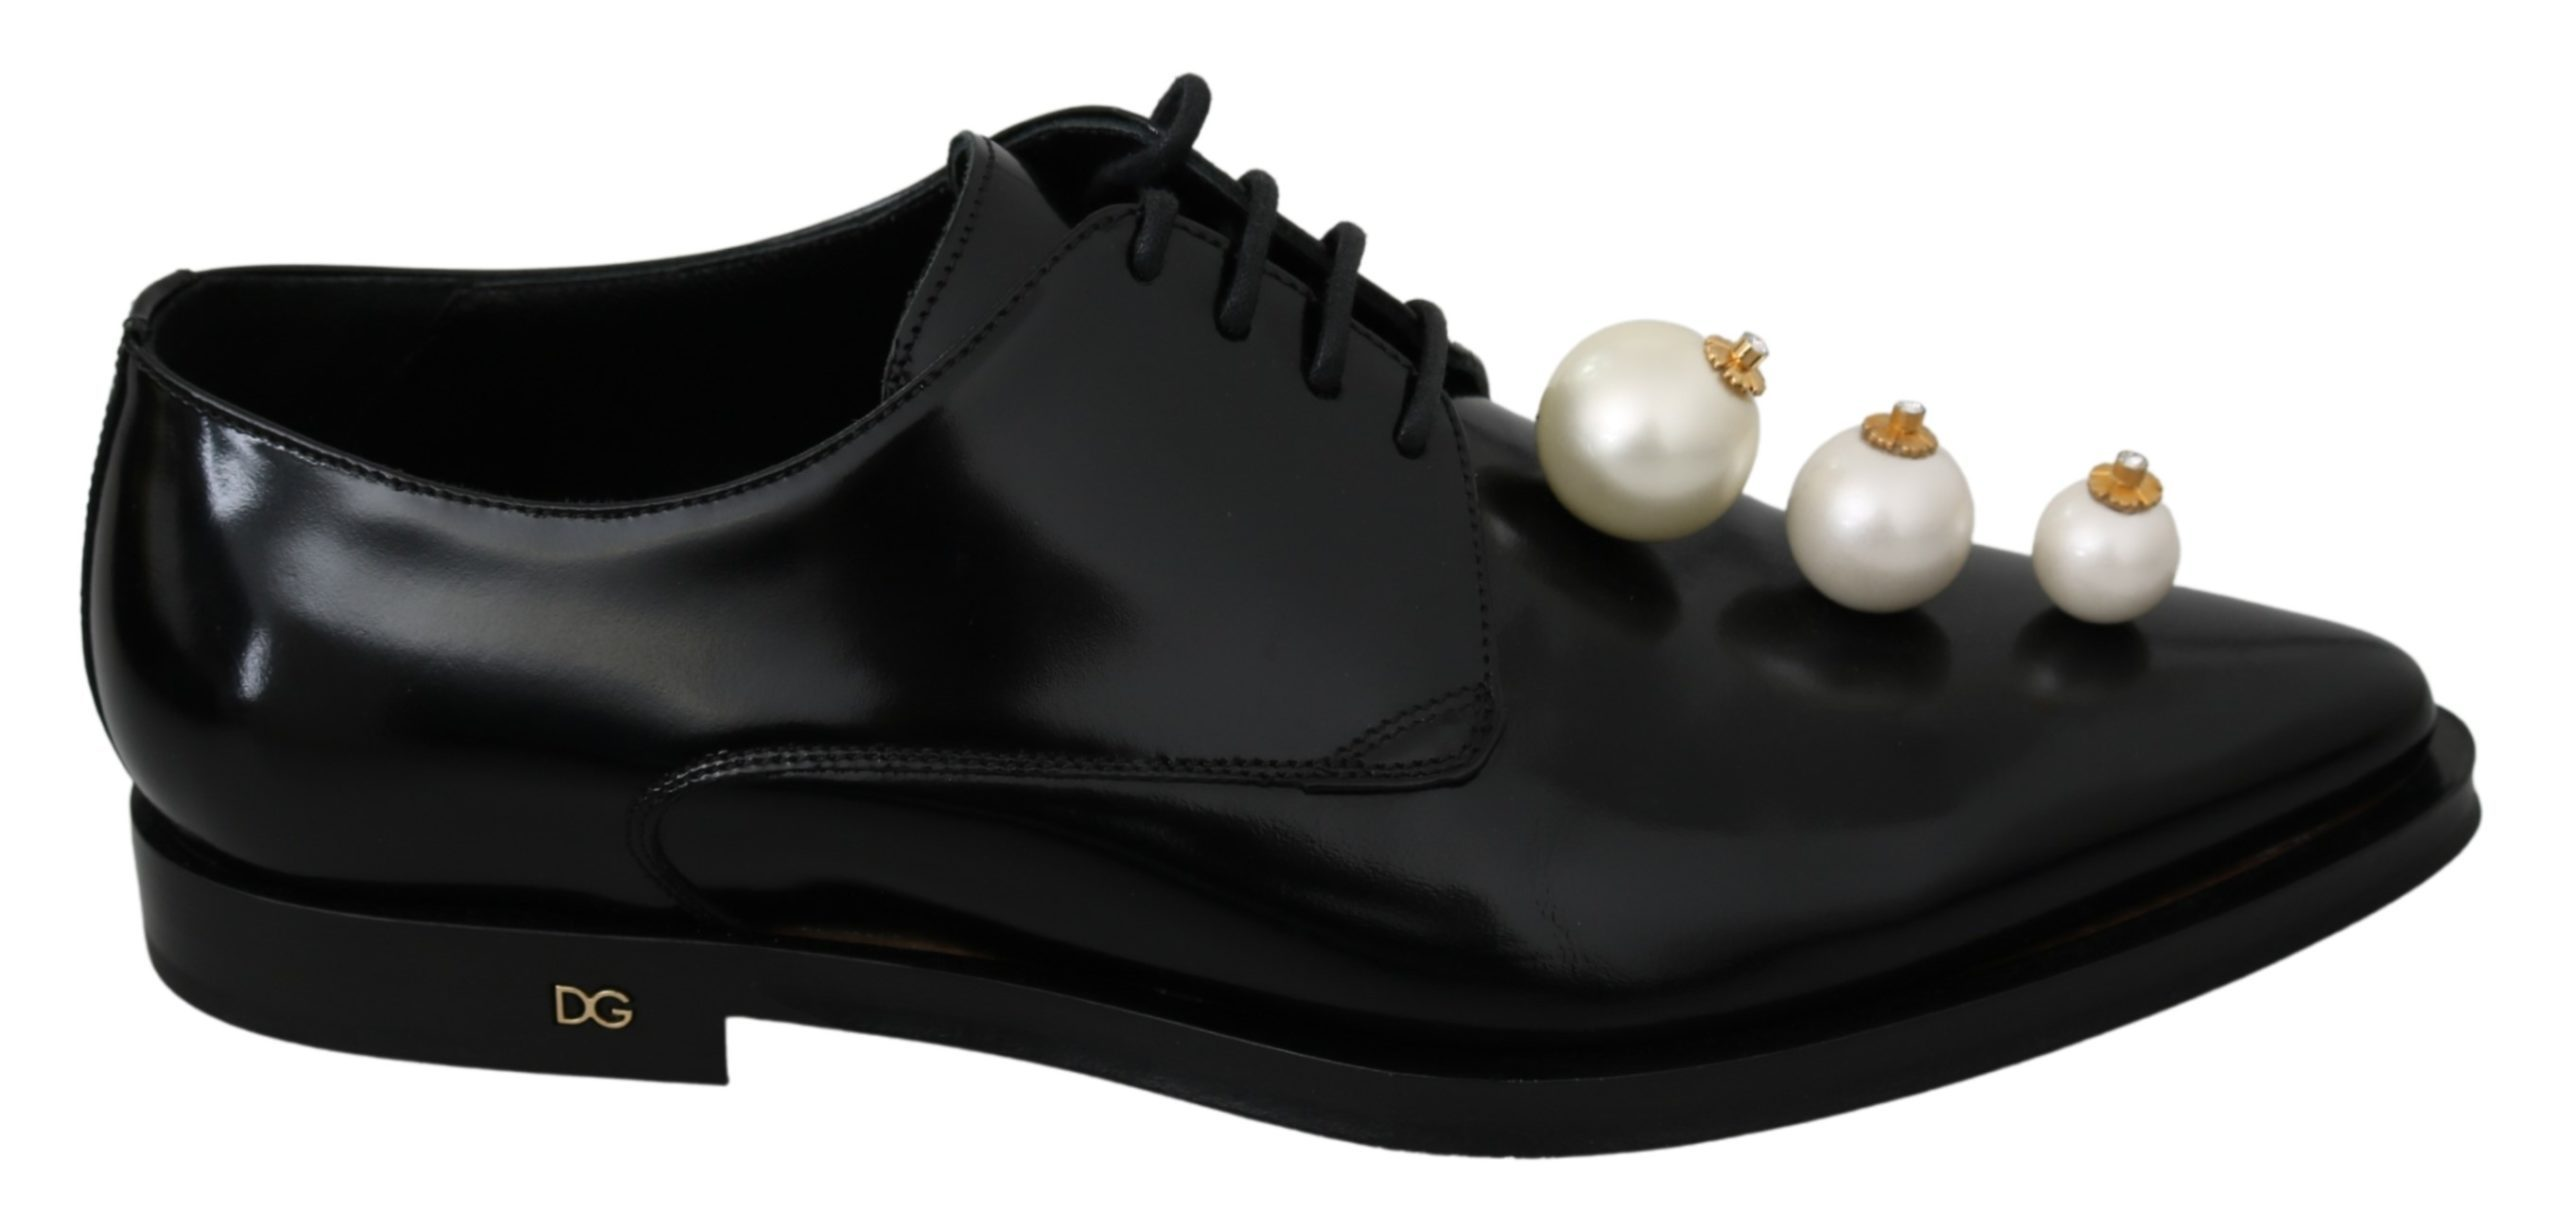 Dolce & Gabbana Women's Leather Pearl Studs Lace Up Formal Shoes Black LA6913 - EU39/US8.5